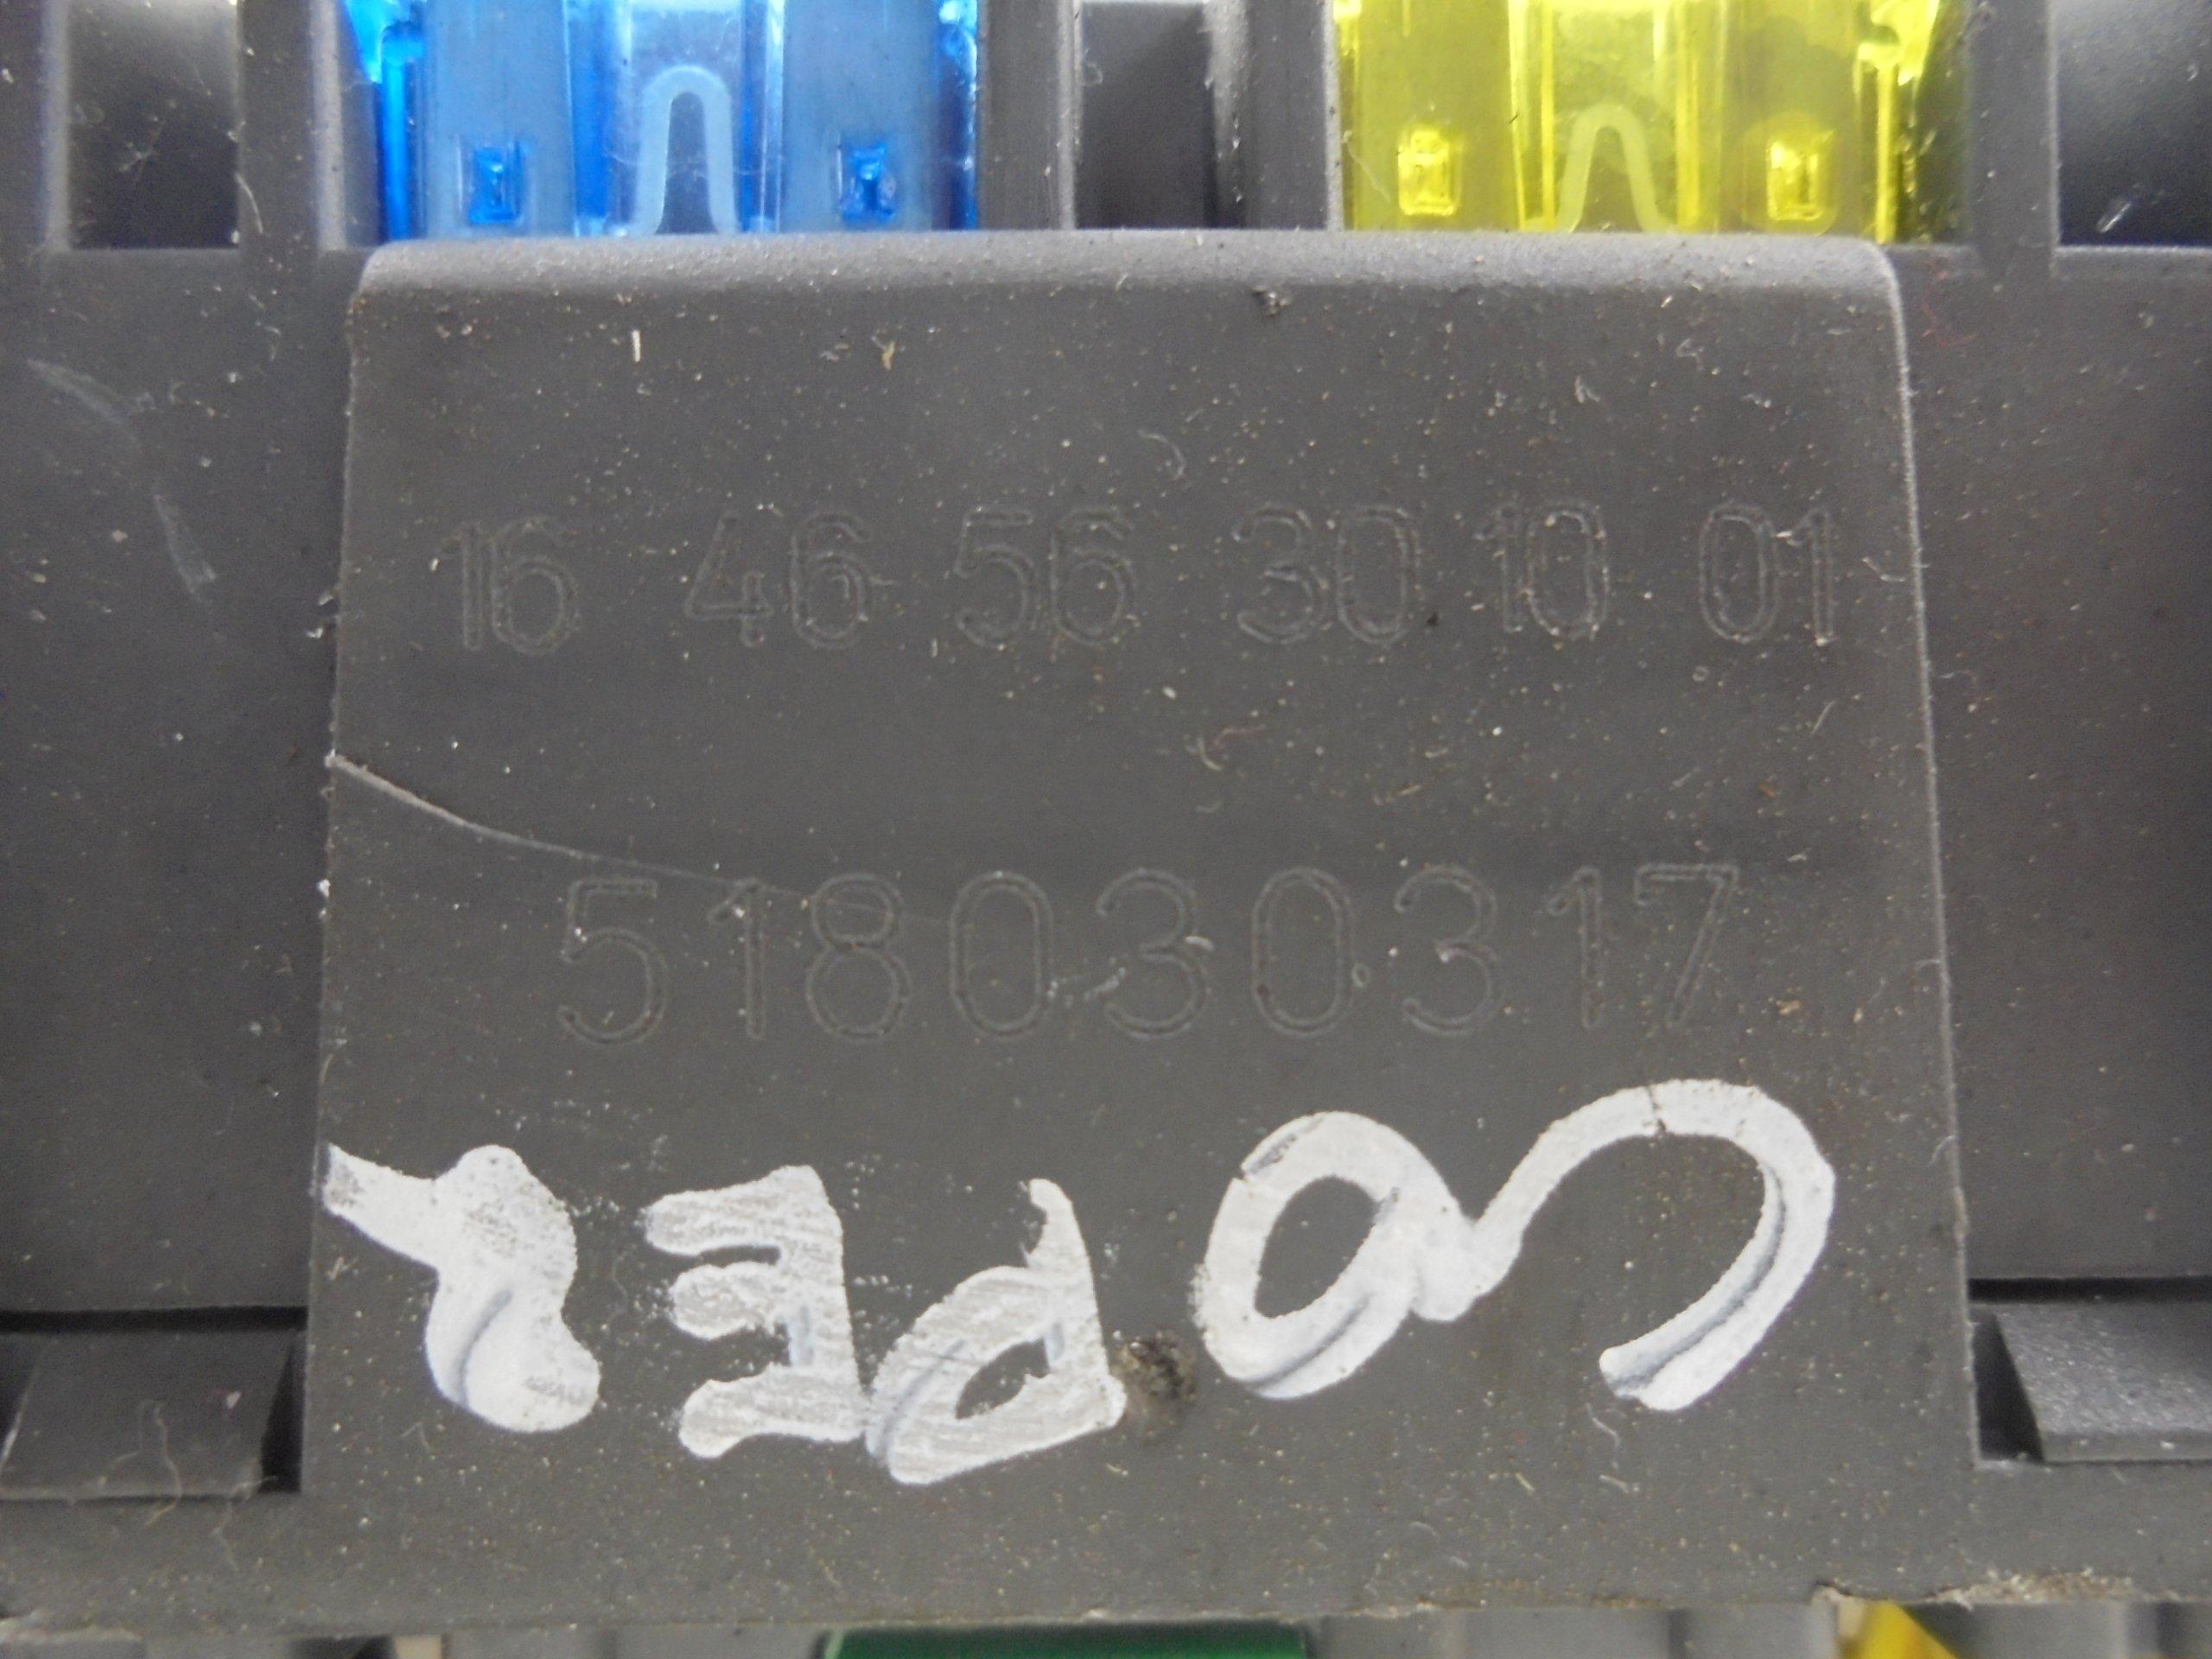 FUSE BOX 518030317 MINI COOPER Mini Cooper Fuse Box on mini cooper amp location, mini cooper fuses diagram, mini cooper master cylinder, mini cooper lighter fuse, mini cooper heater box, mini cooper transfer case, mini cooper window motor, mini cooper blower motor, mini cooper charcoal canister, mini cooper a/c evaporator, mini cooper brake switch, mini cooper body control module, mini cooper throttle body, mini cooper brake fluid reservoir, mini cooper fan resistor, mini cooper trunk lid, mini cooper ac diagram, mini cooper heater hose, mini cooper steering column, mini cooper power steering fluid reservoir,